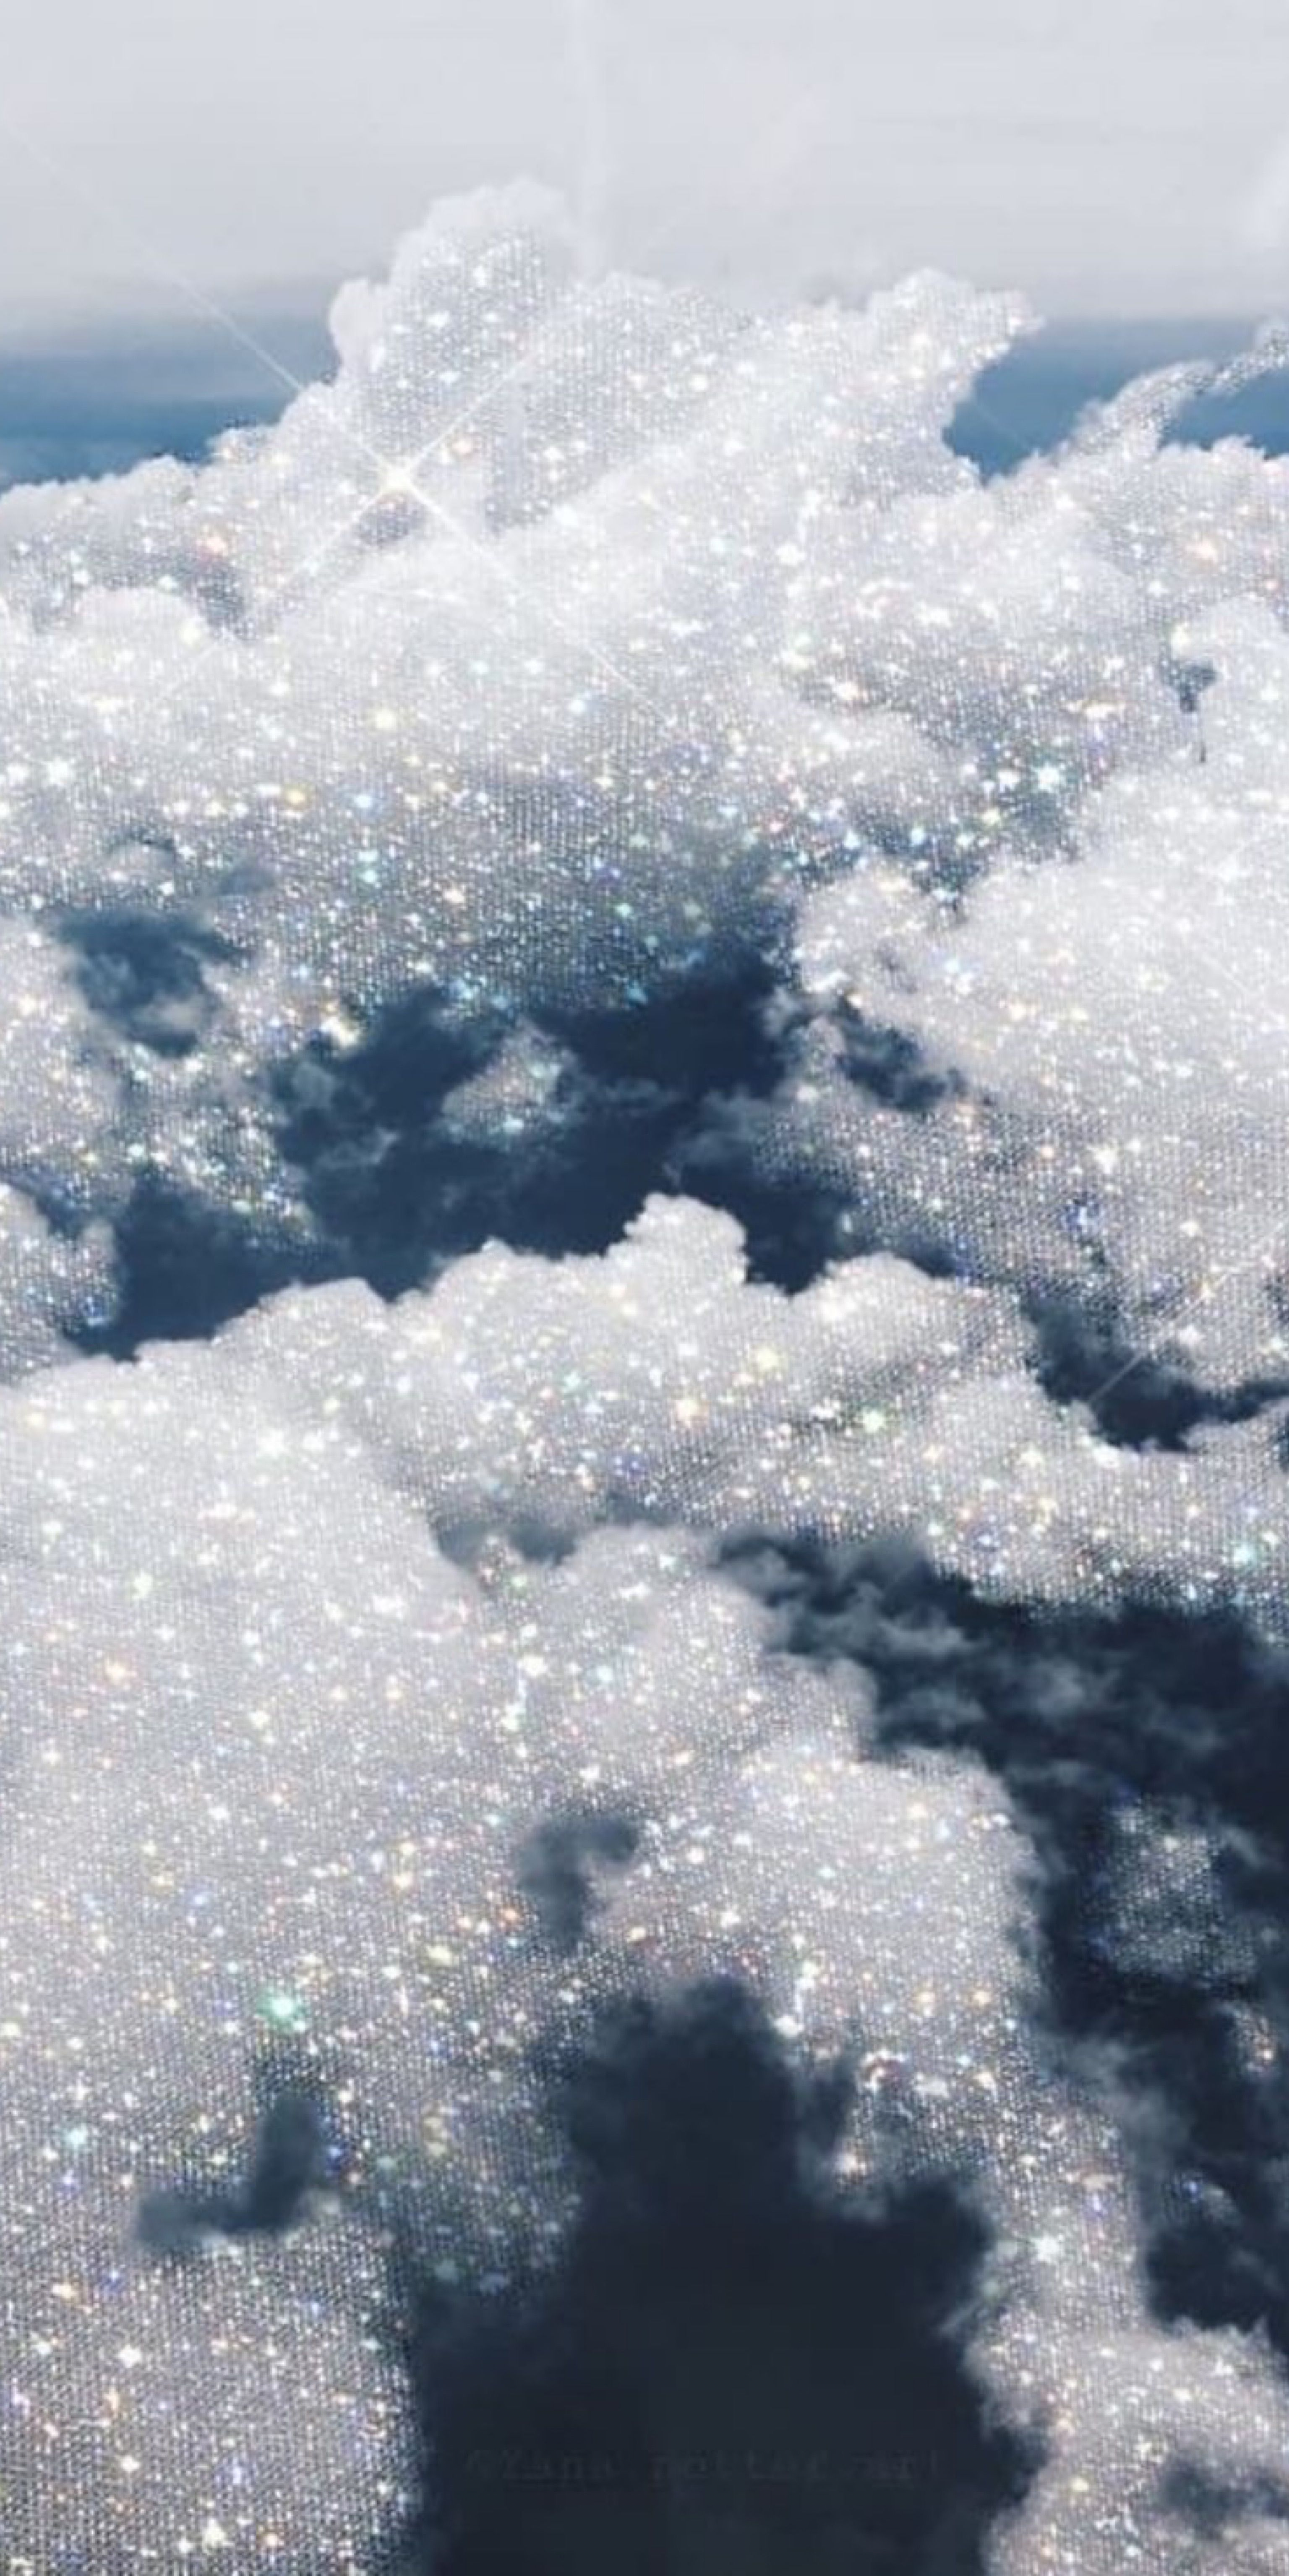 wallpaper Glittery wallpaper Iphone wallpaper sky Sparkle 3072x6138